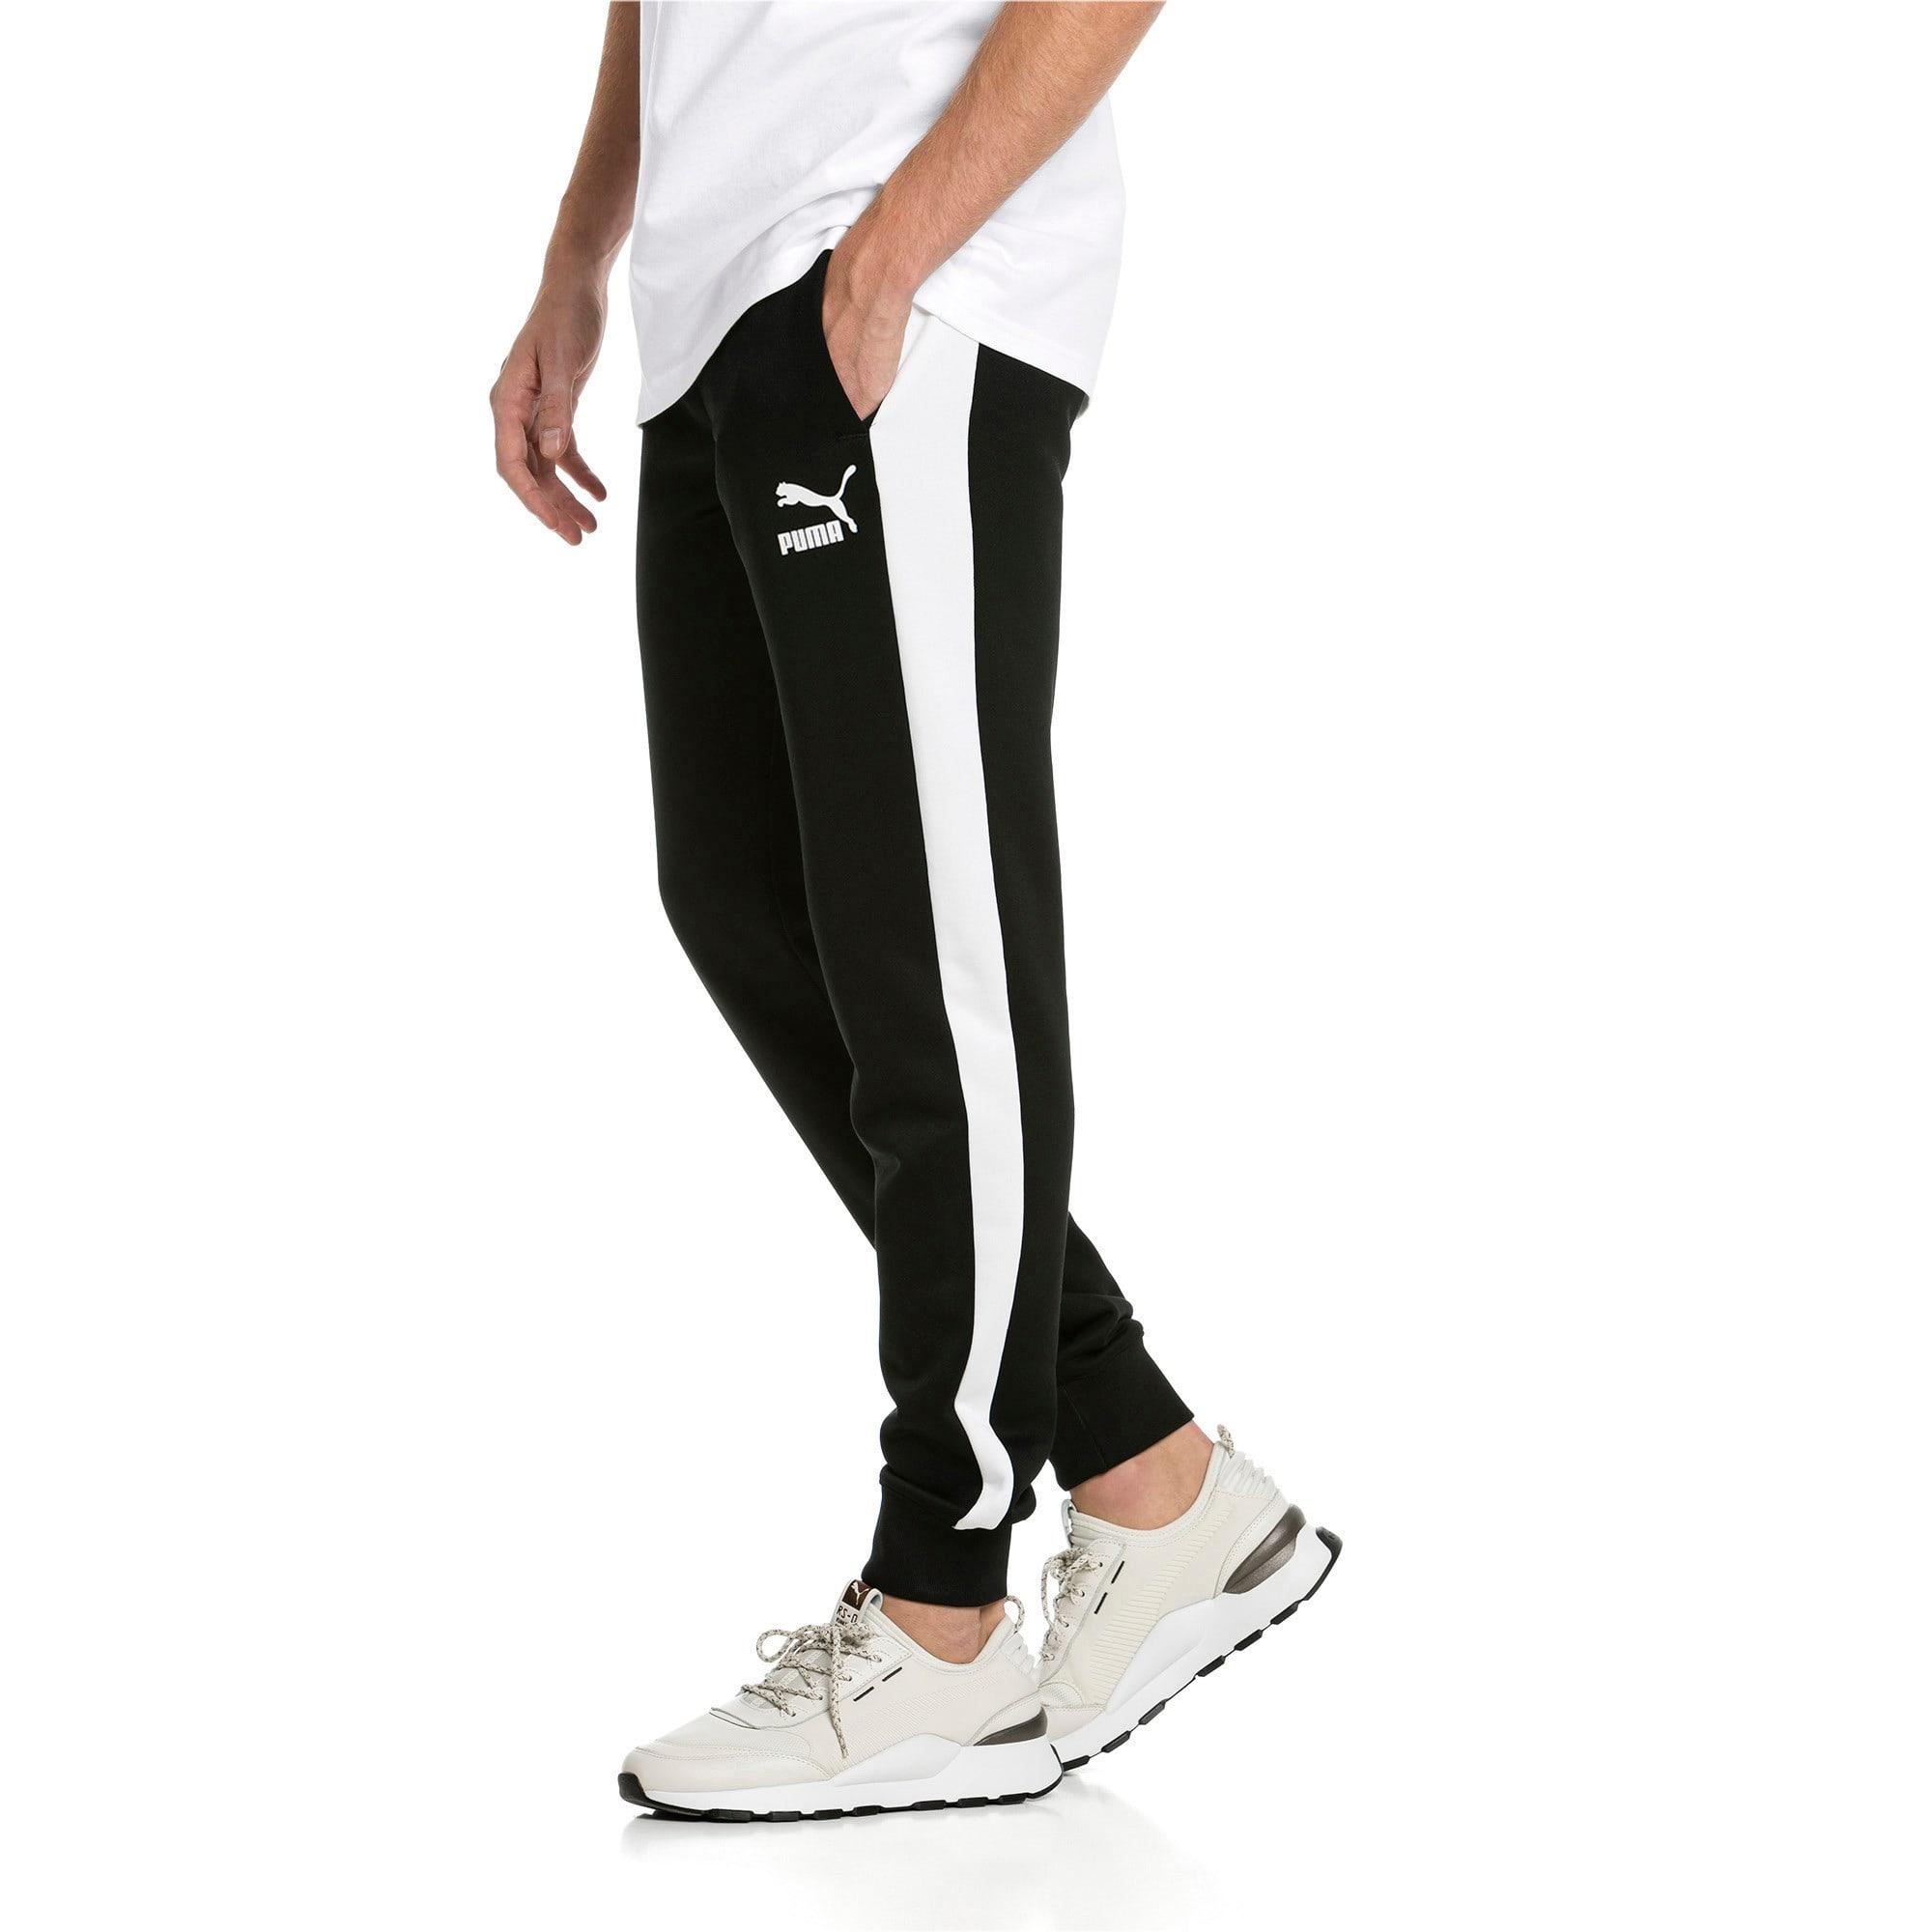 Thumbnail 1 of Iconic T7 Kntted Men's Sweatpants, Puma Black, medium-IND